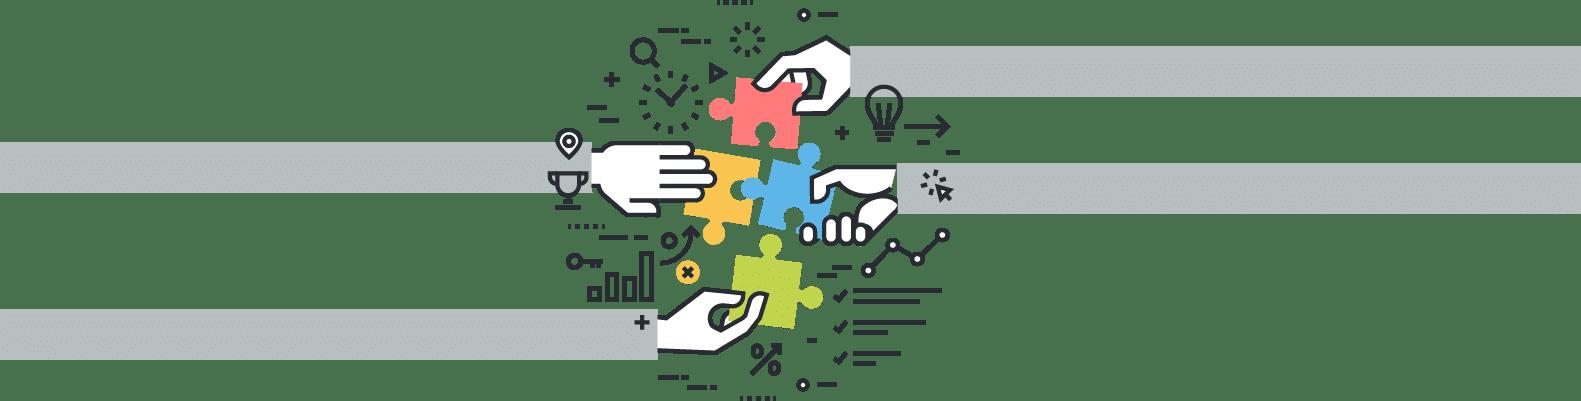 planejamento mediatriz Planejamento